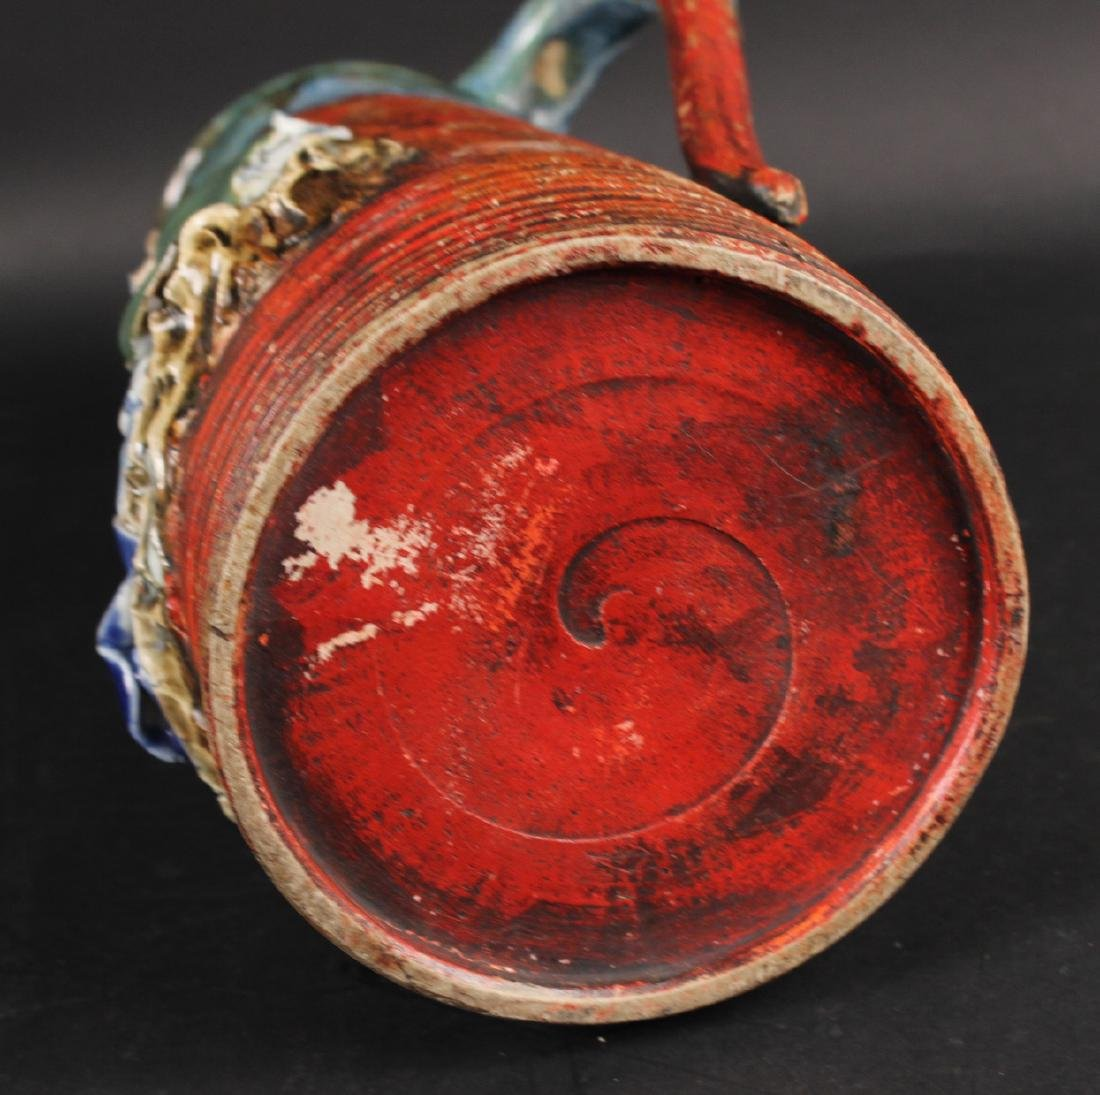 Japanese Pottery Figural Pitcher - 5